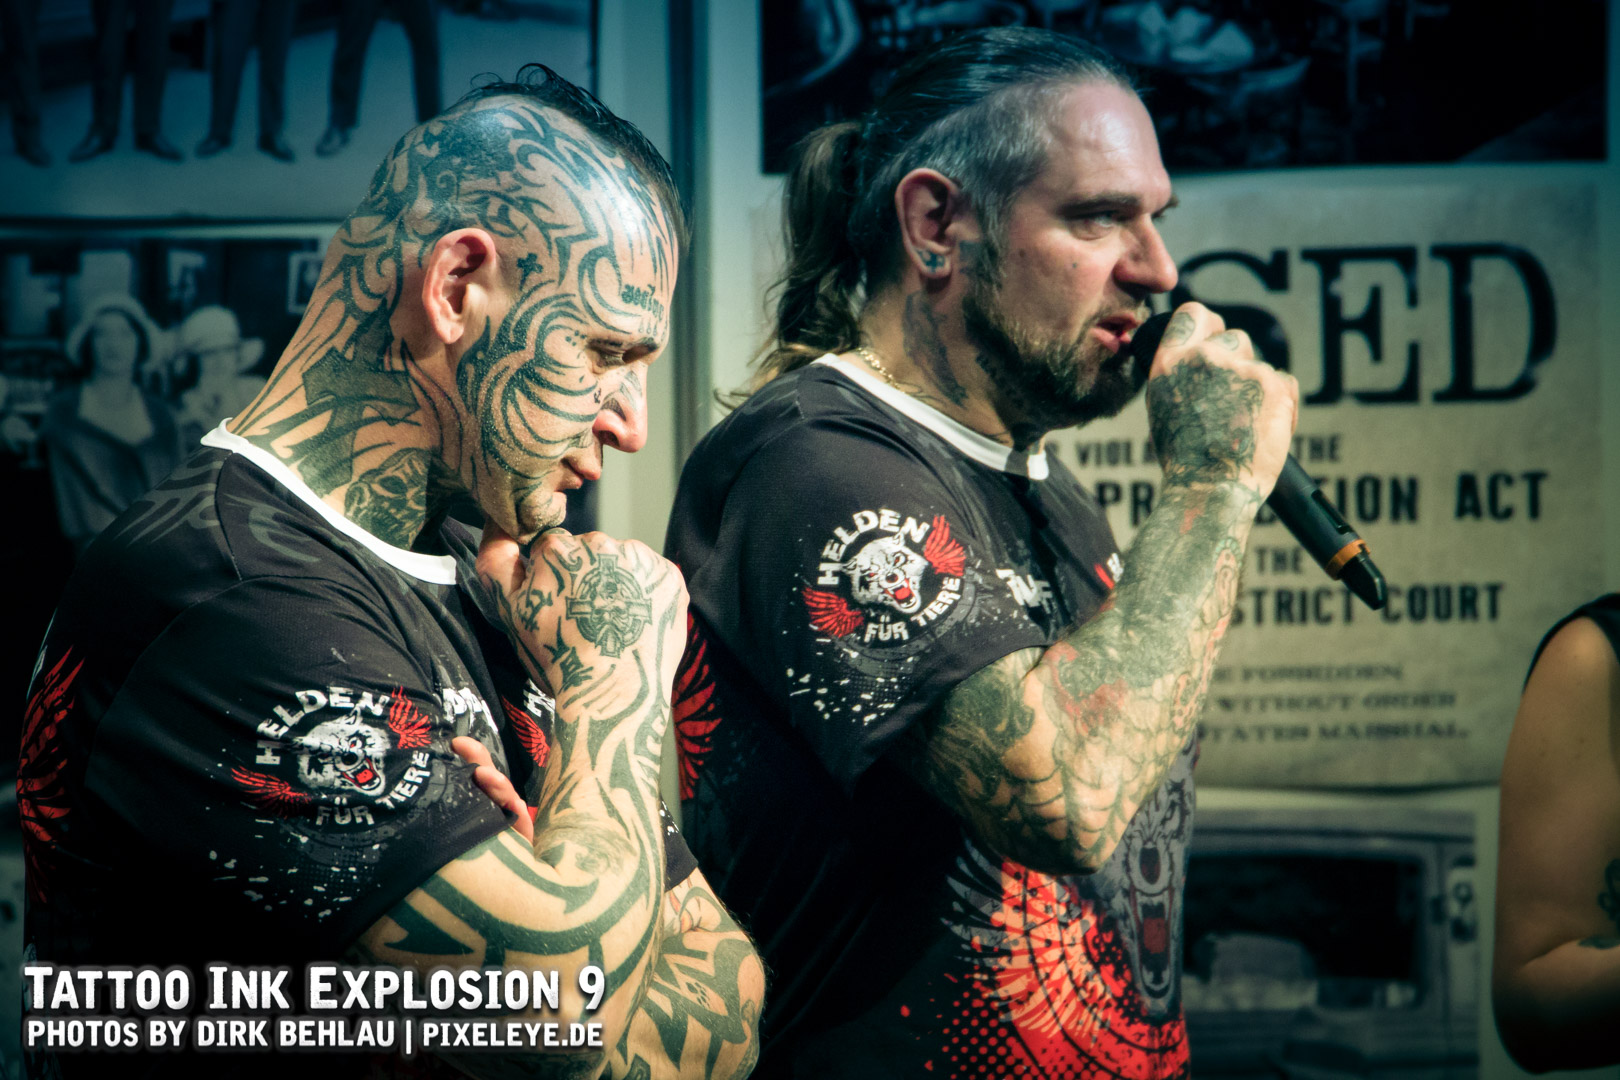 Tattoo Ink Explosion 2018 WEB by Dirk Behlau-0466.jpg